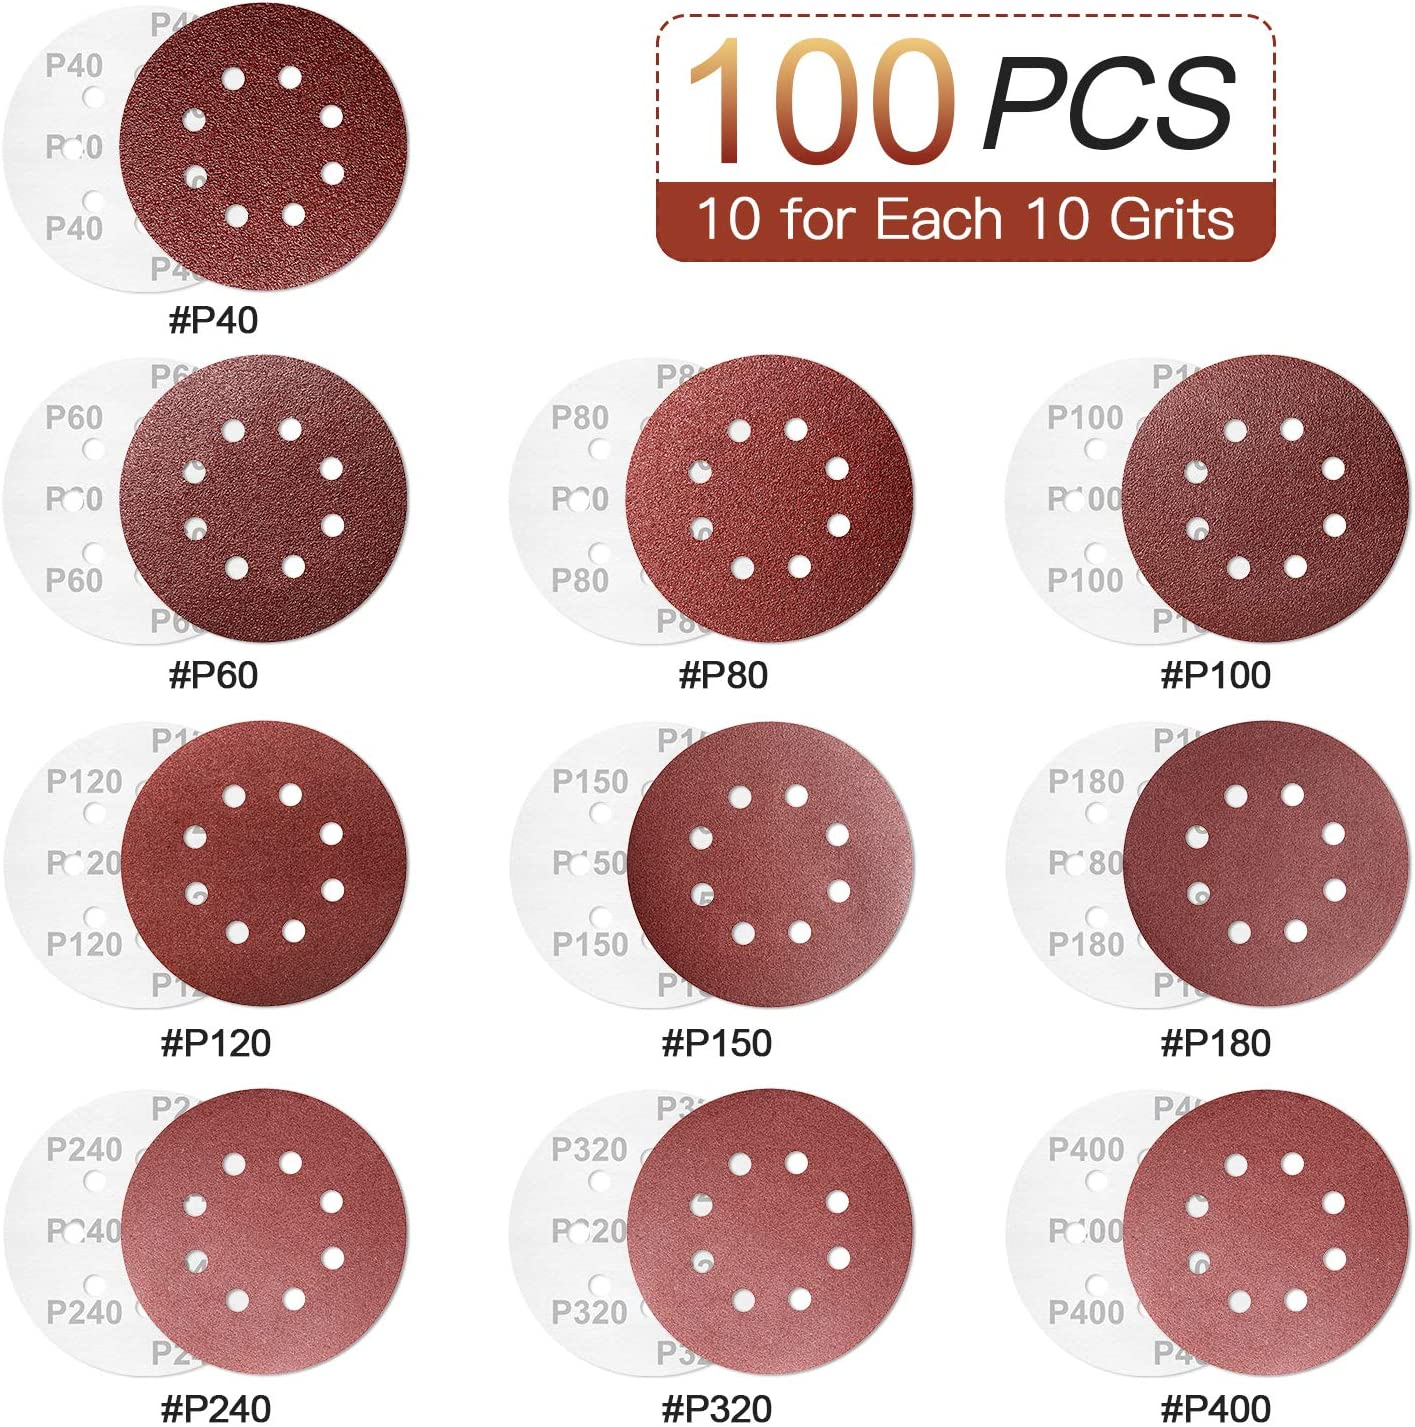 HTLY SPR 8-Holes Hook and Loop Sanding Discs 40//60// 80//100// 120//150// 180//240// 320//400 Grits Assorted Sandpaper Pads 125mm for Random Orbital Sander Sanding Discs Pads 60 PCS